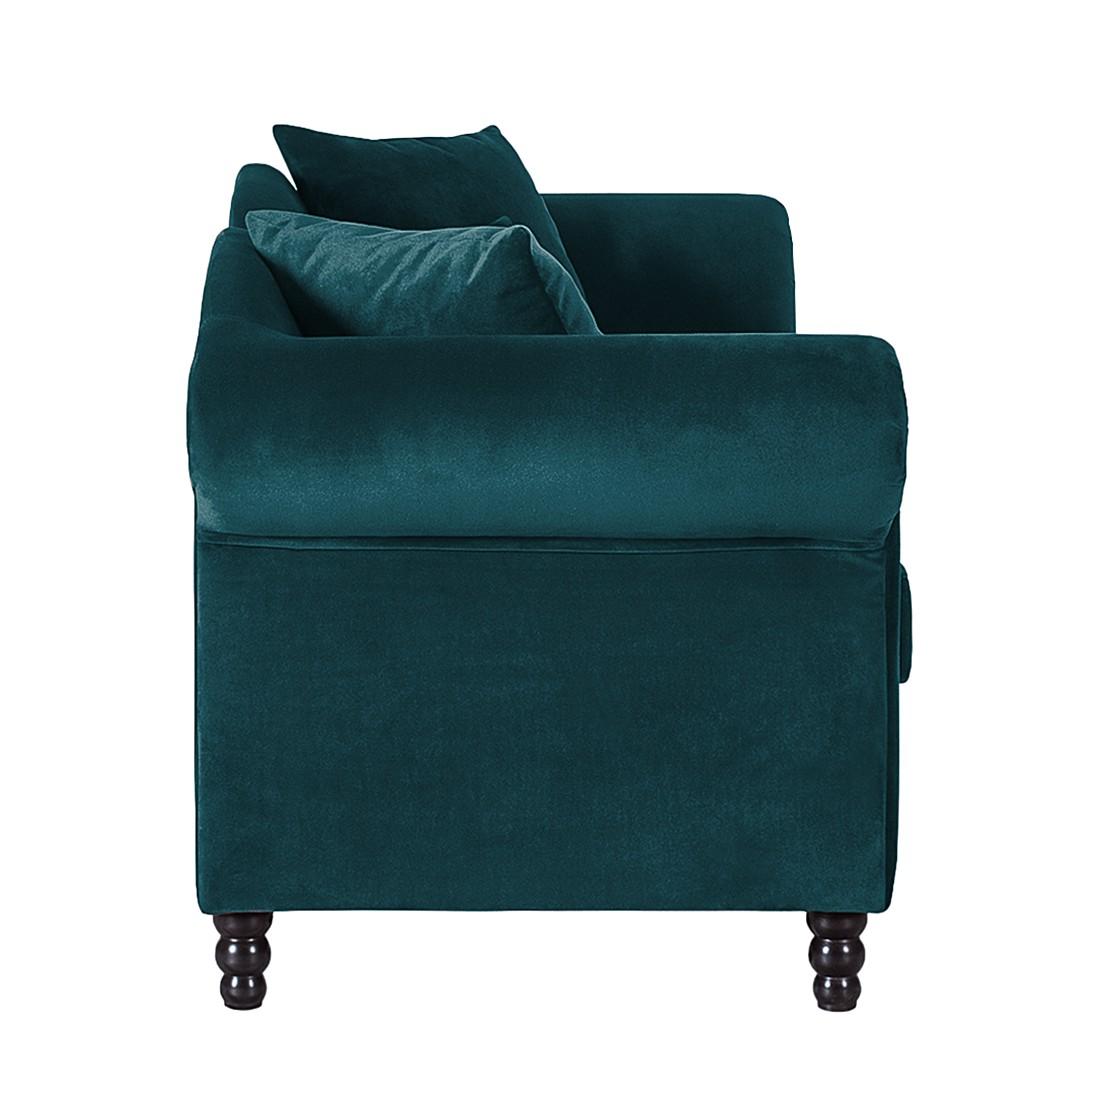 sofa york 3 sitzer samtstoff petrol jack and alice g nstig schnell einkaufen. Black Bedroom Furniture Sets. Home Design Ideas